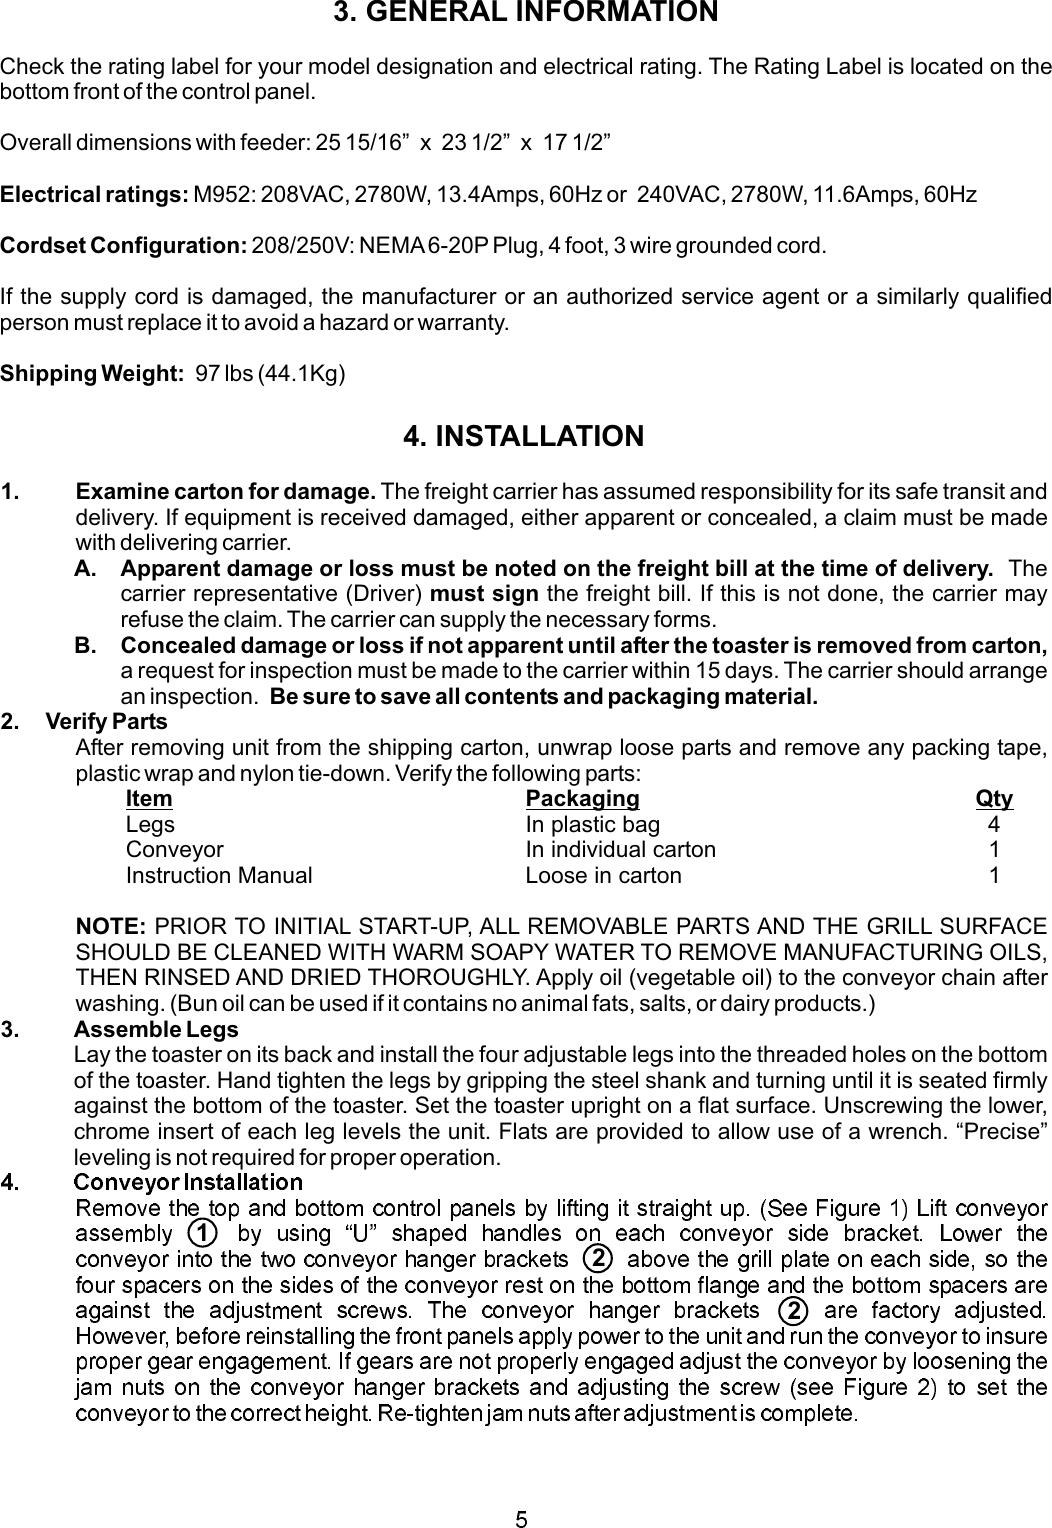 Apw Wyott M95 2 Jib Users Manual A Wiring Diagram Page 5 Of 12